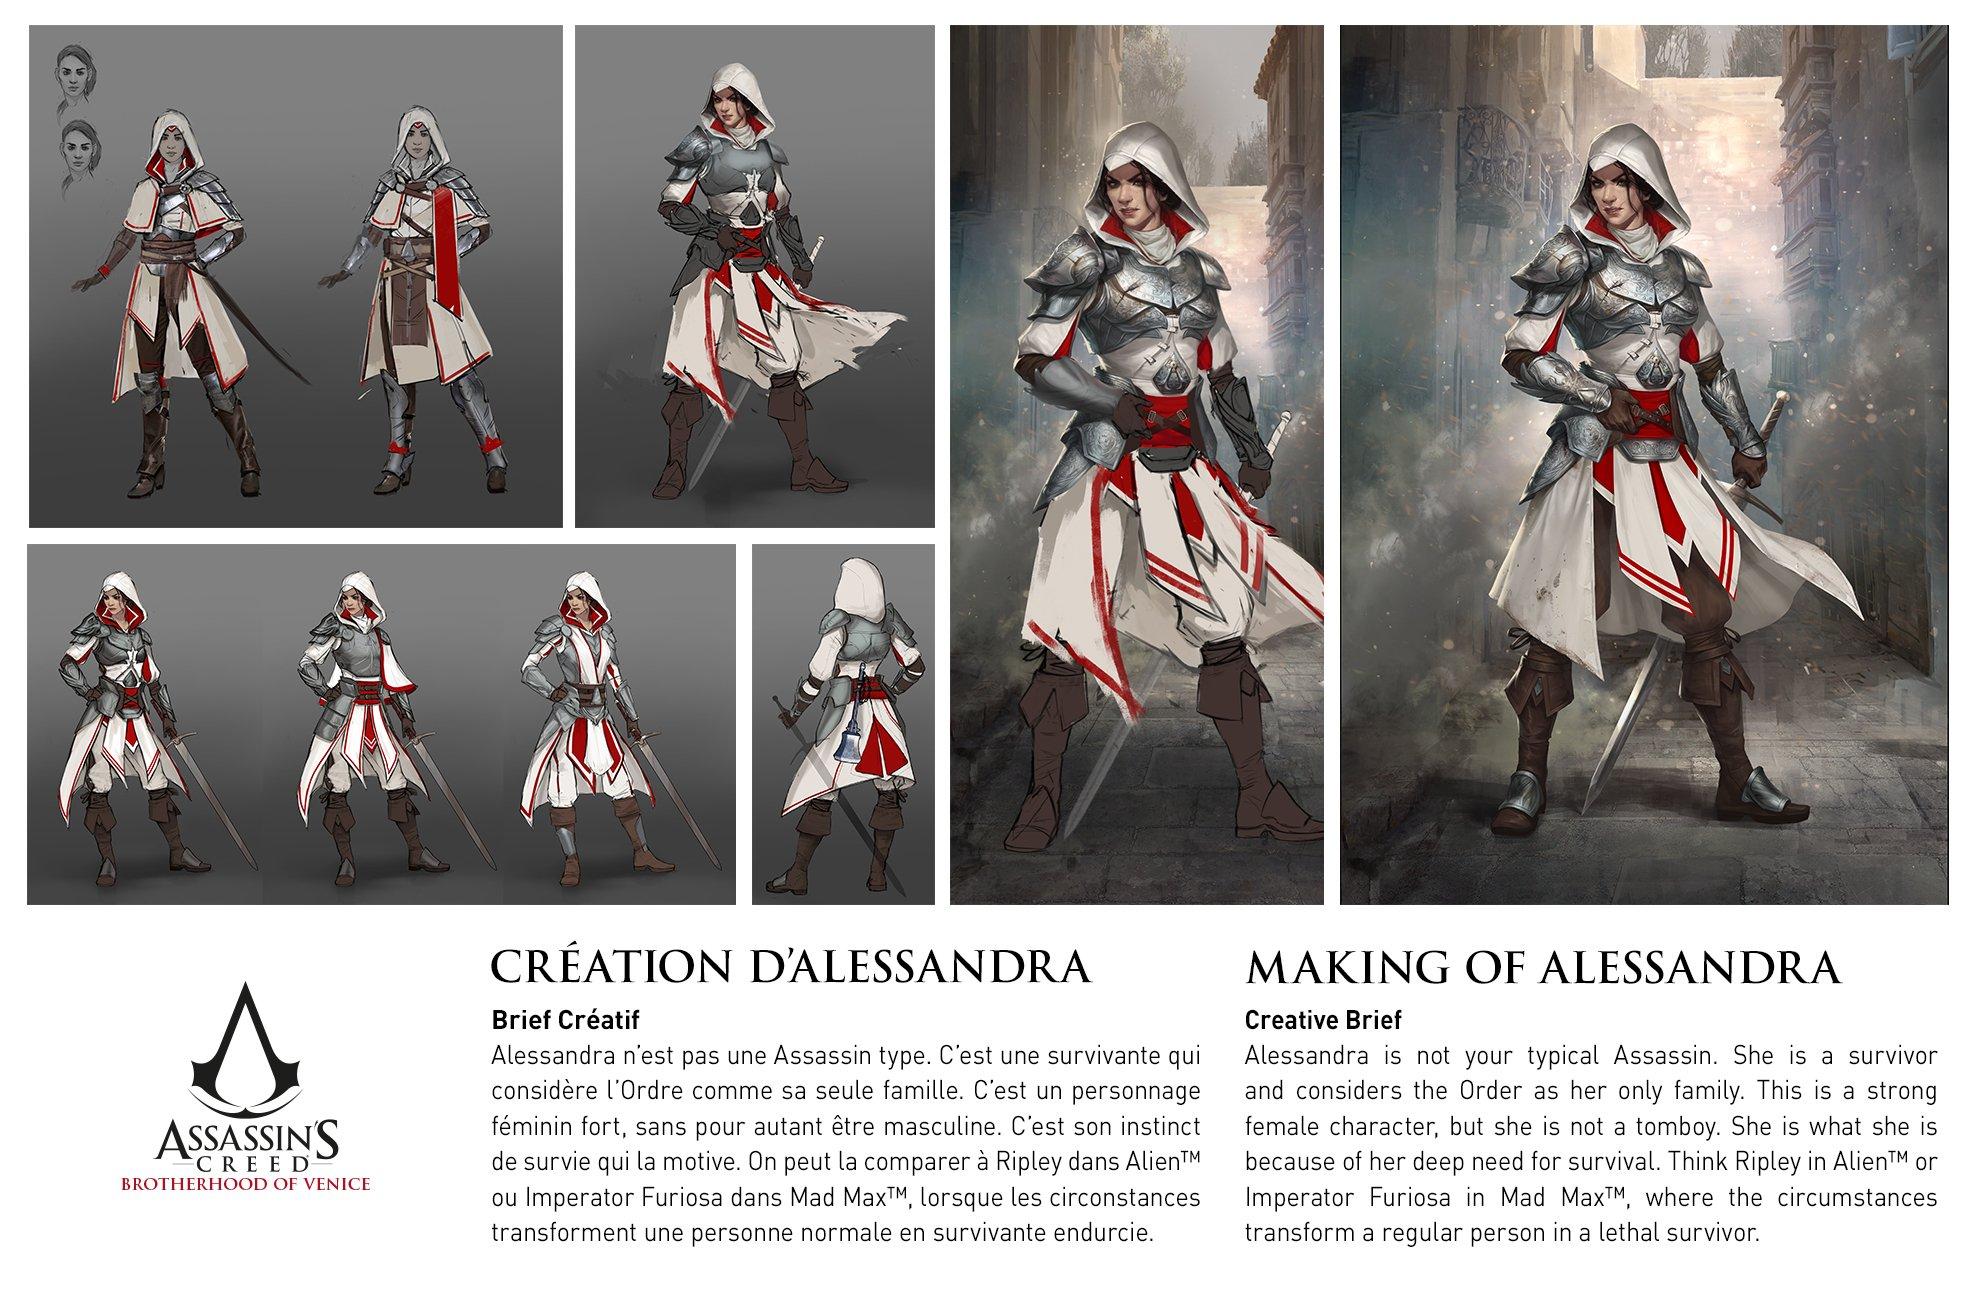 Assassin S Creed Brotherhood Of Venice On Twitter Creative